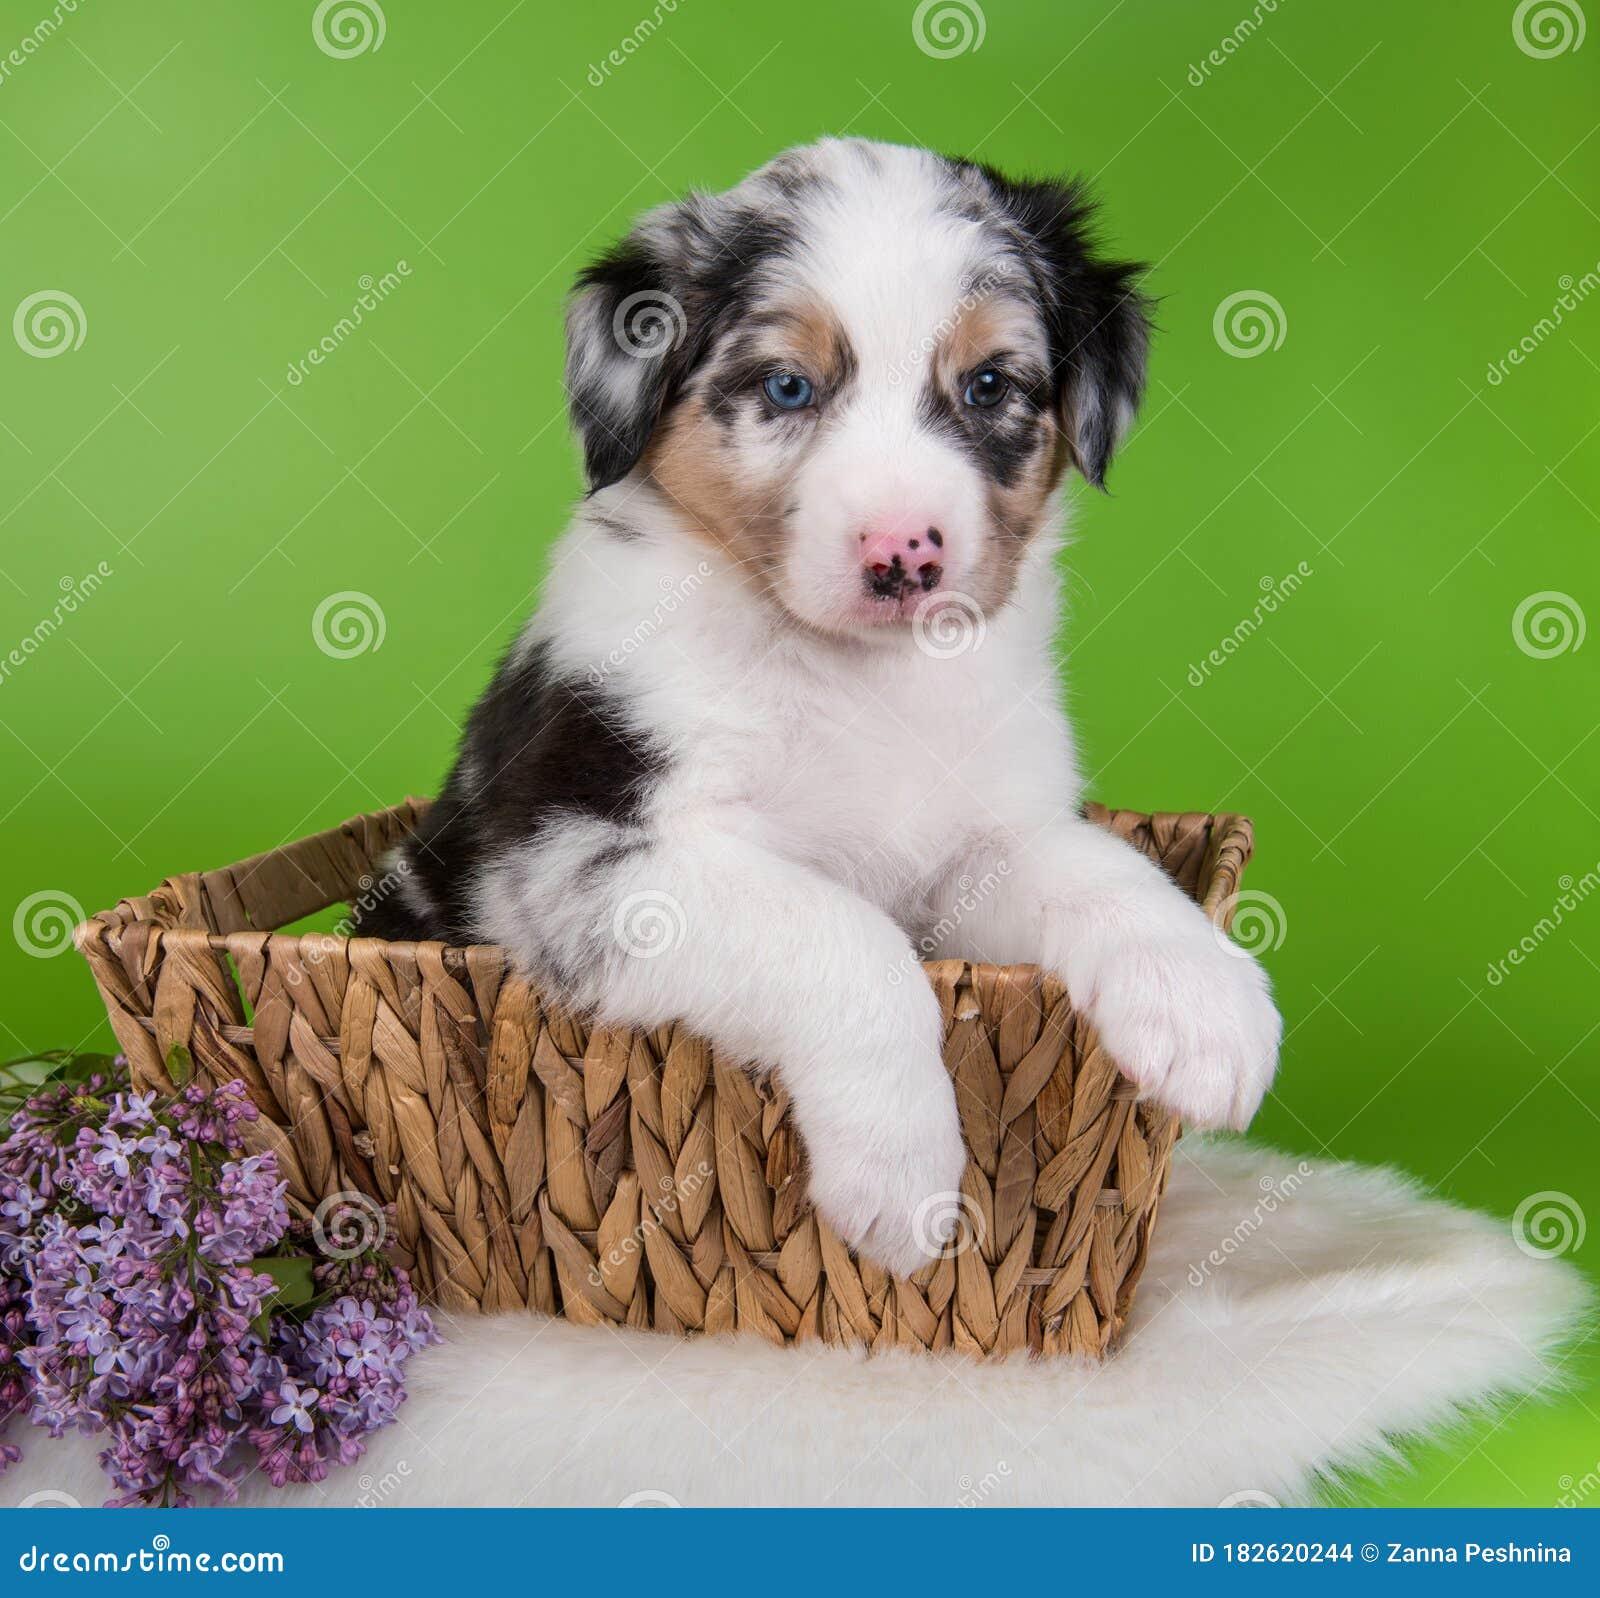 Red Merle Australian Shepherd Puppy Lilac Flowers Stock Photo Image Of Canine Portrait 182620244